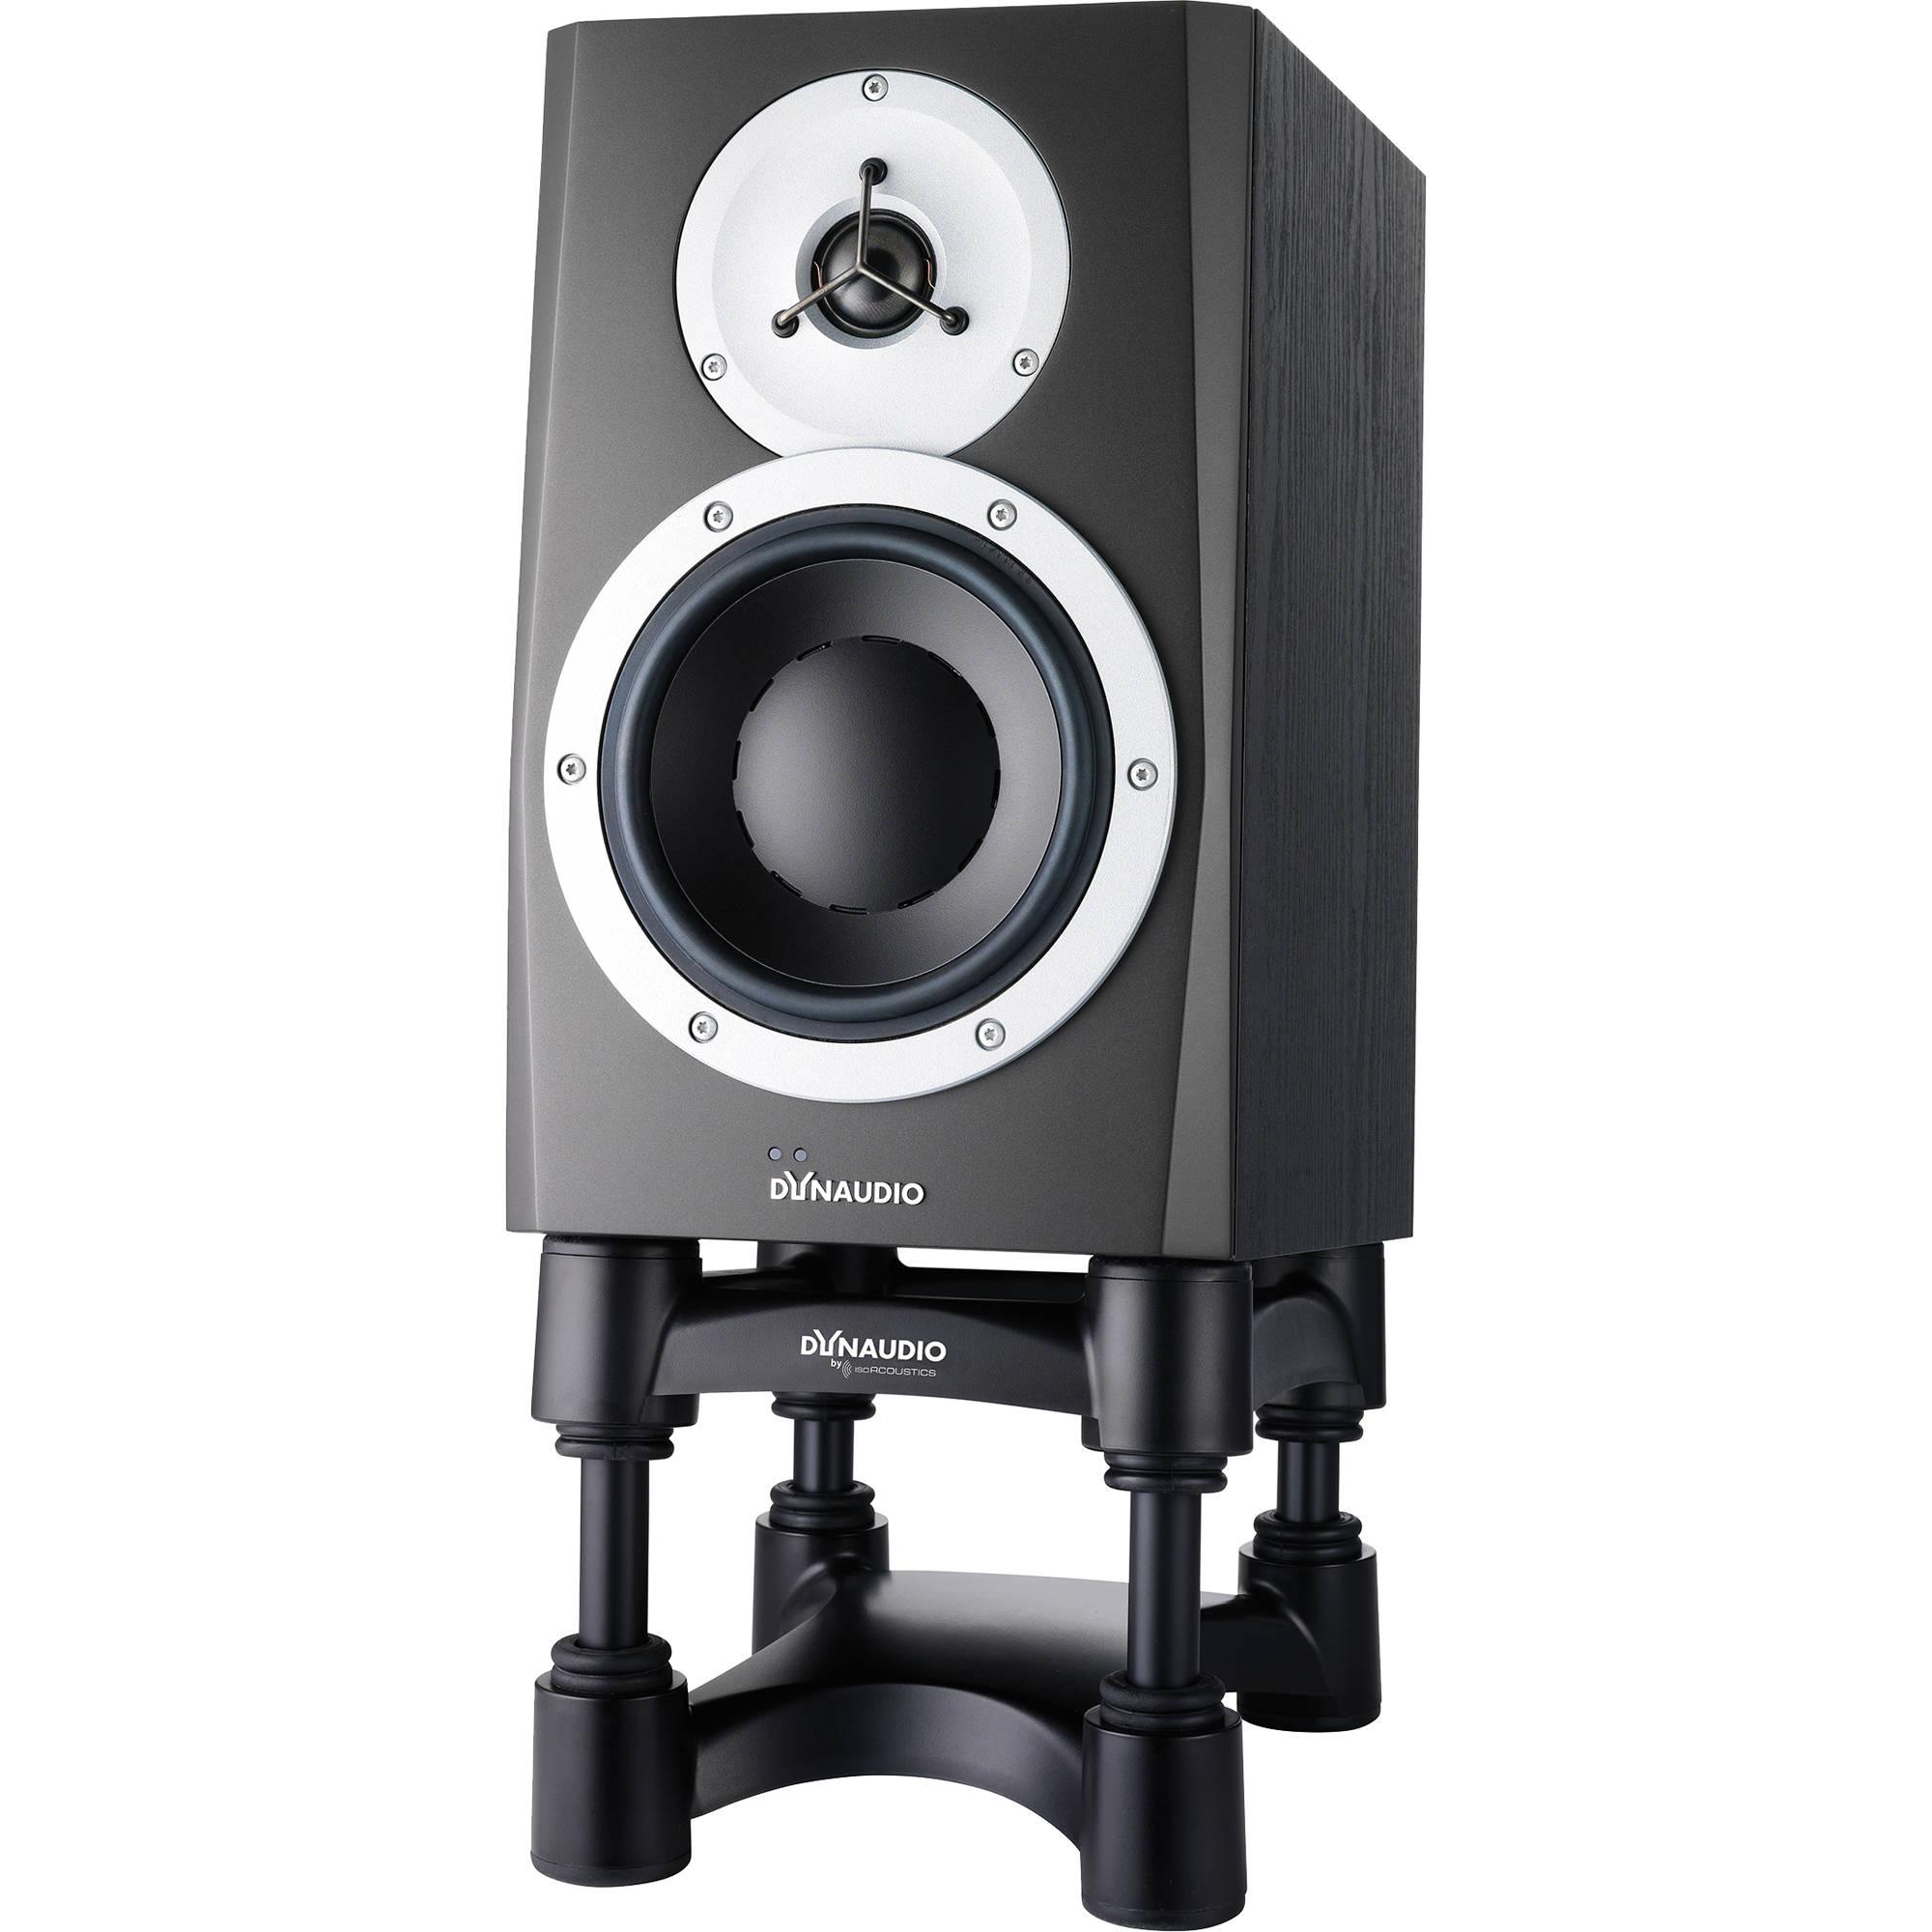 dynaudio acoustics bm6 mkiii studio monitor bm6mkiii b h photo. Black Bedroom Furniture Sets. Home Design Ideas